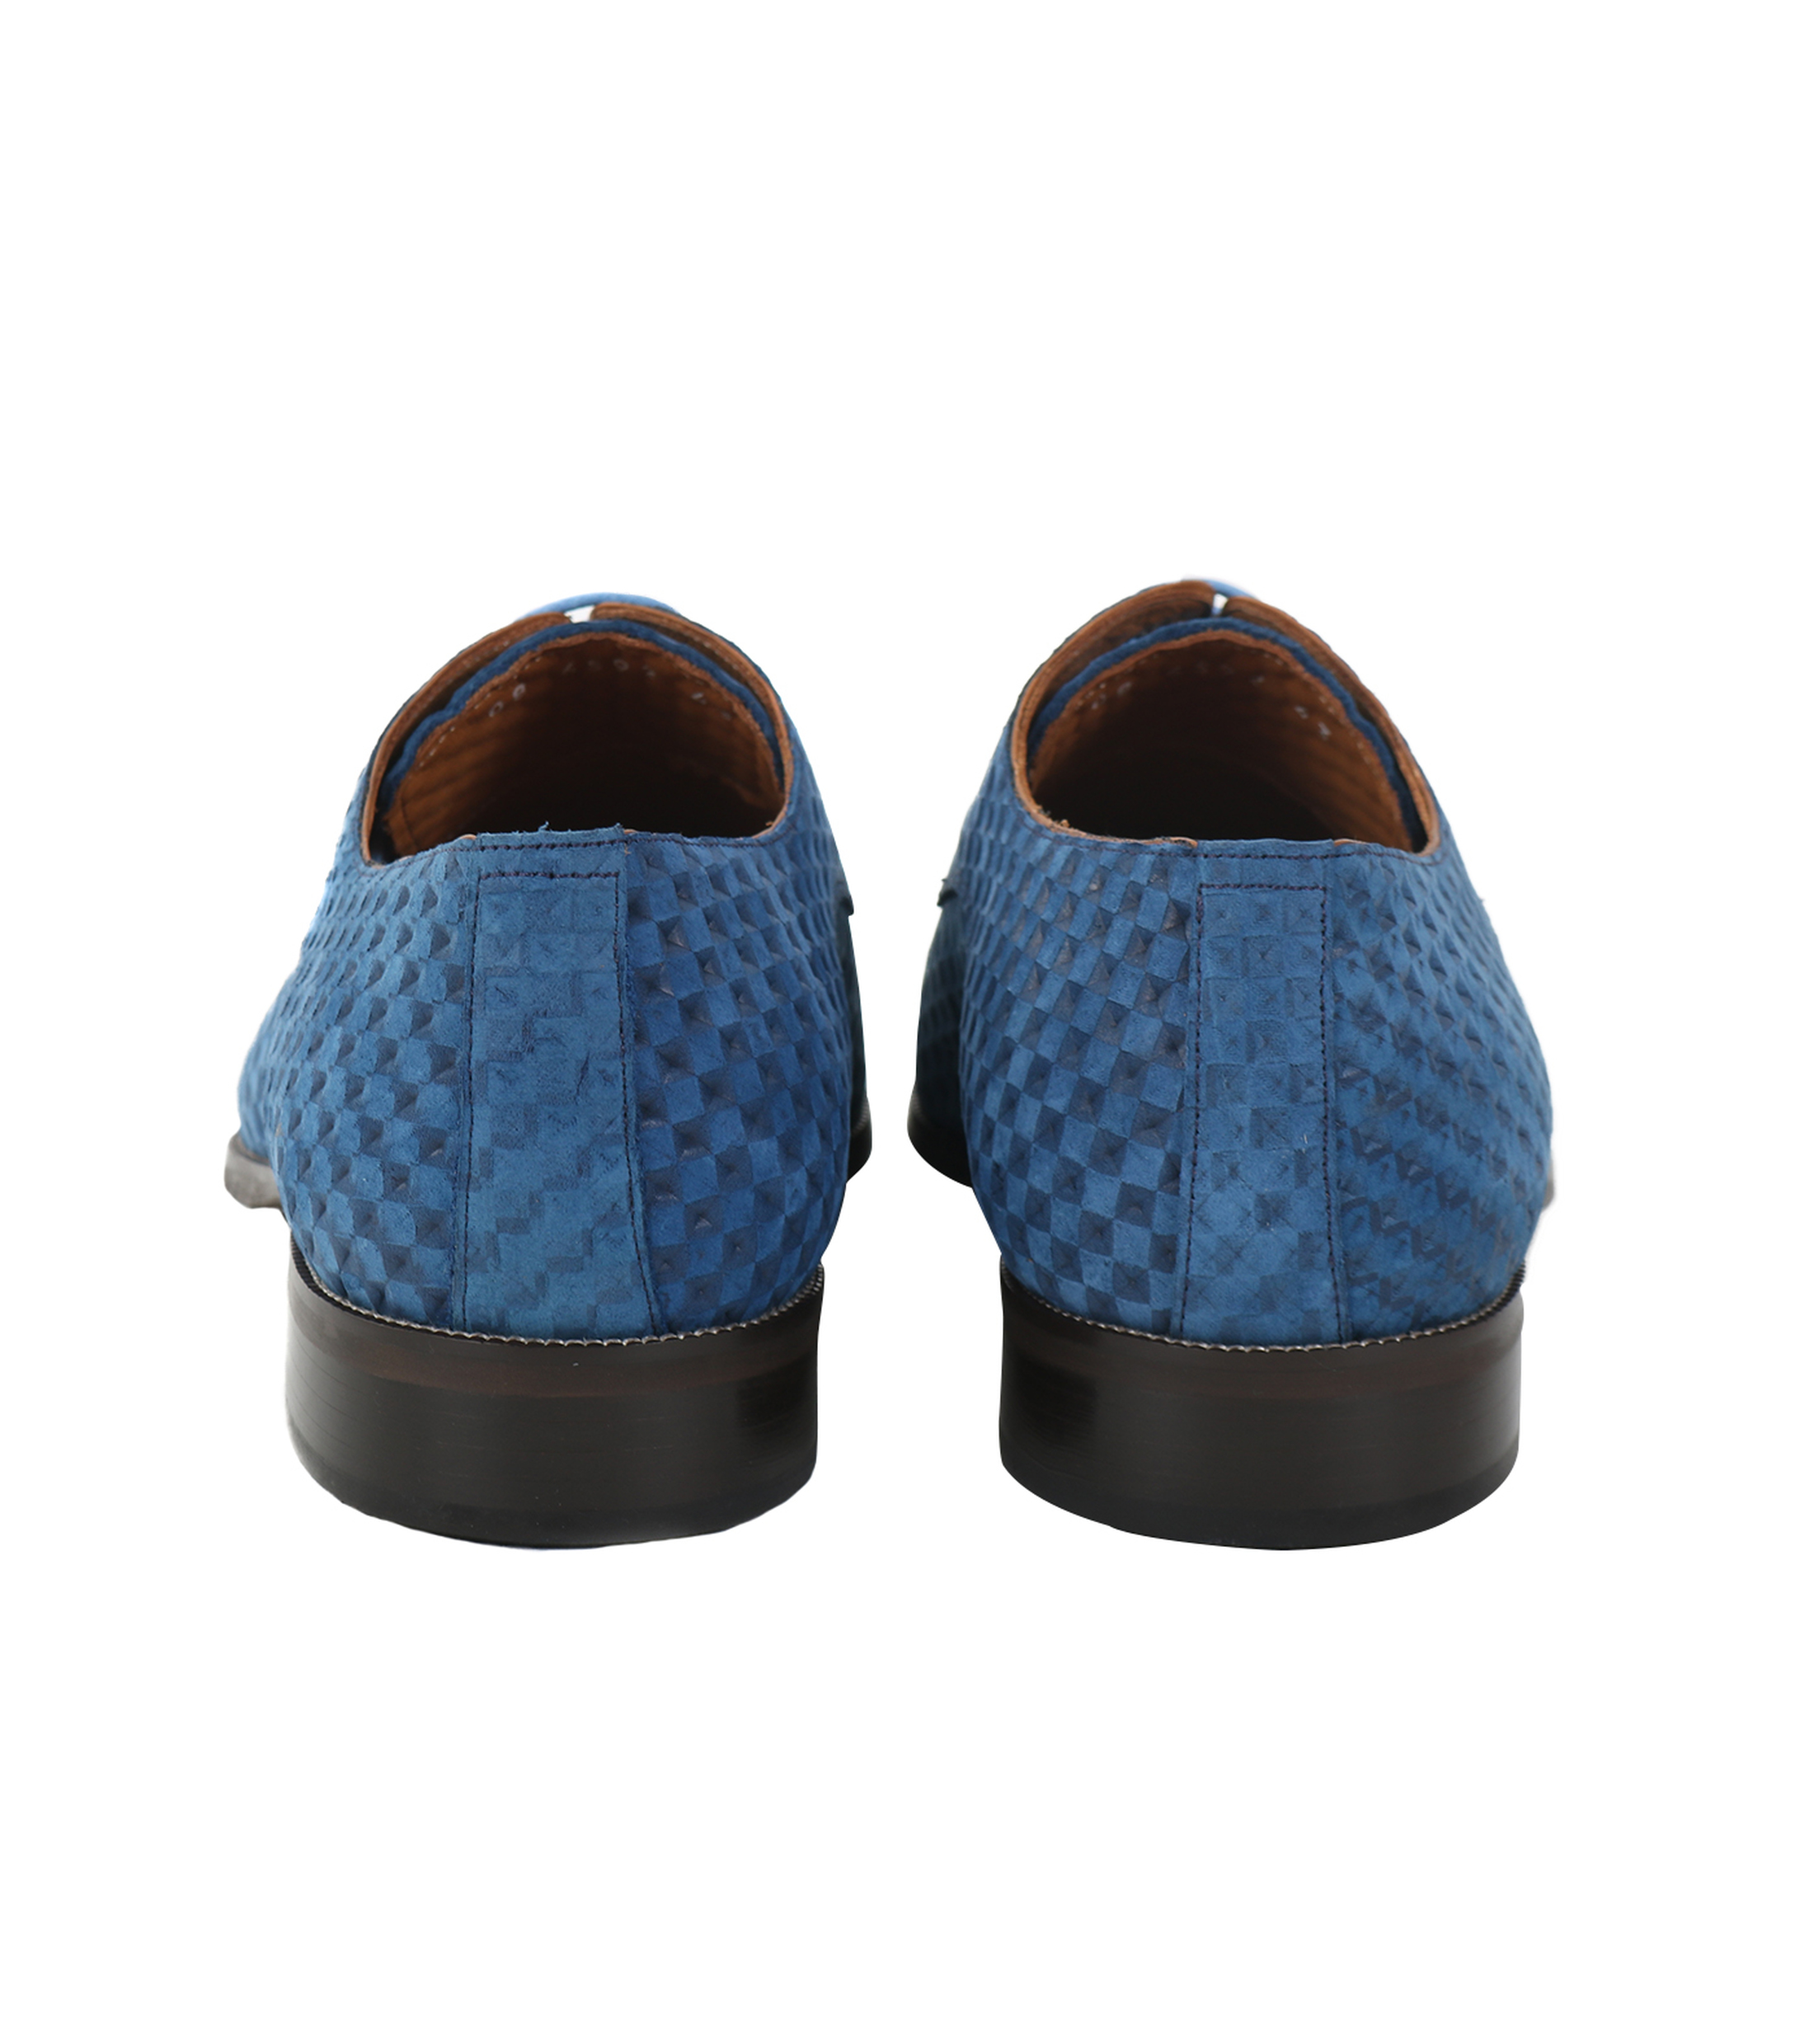 Leder Schuh Blau foto 2